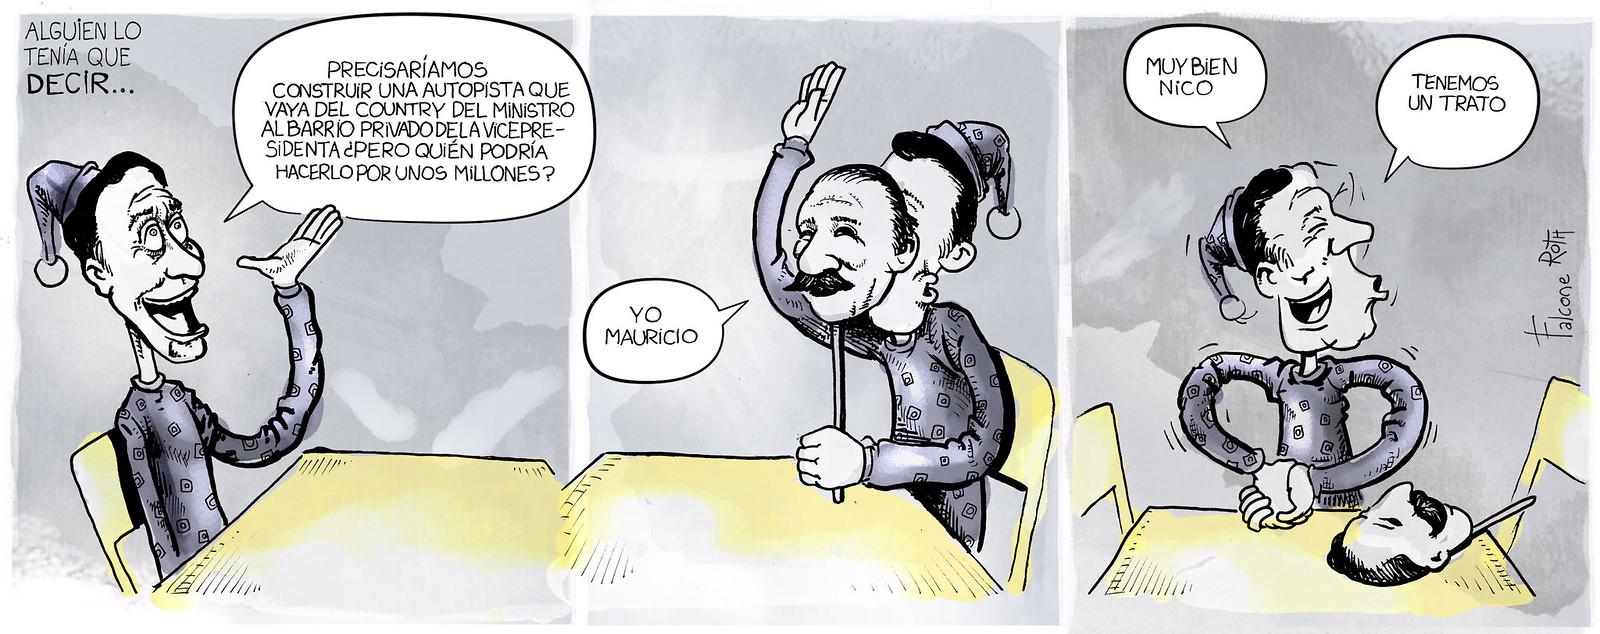 personalidades Mauricio Macri - Nicolas Caputo